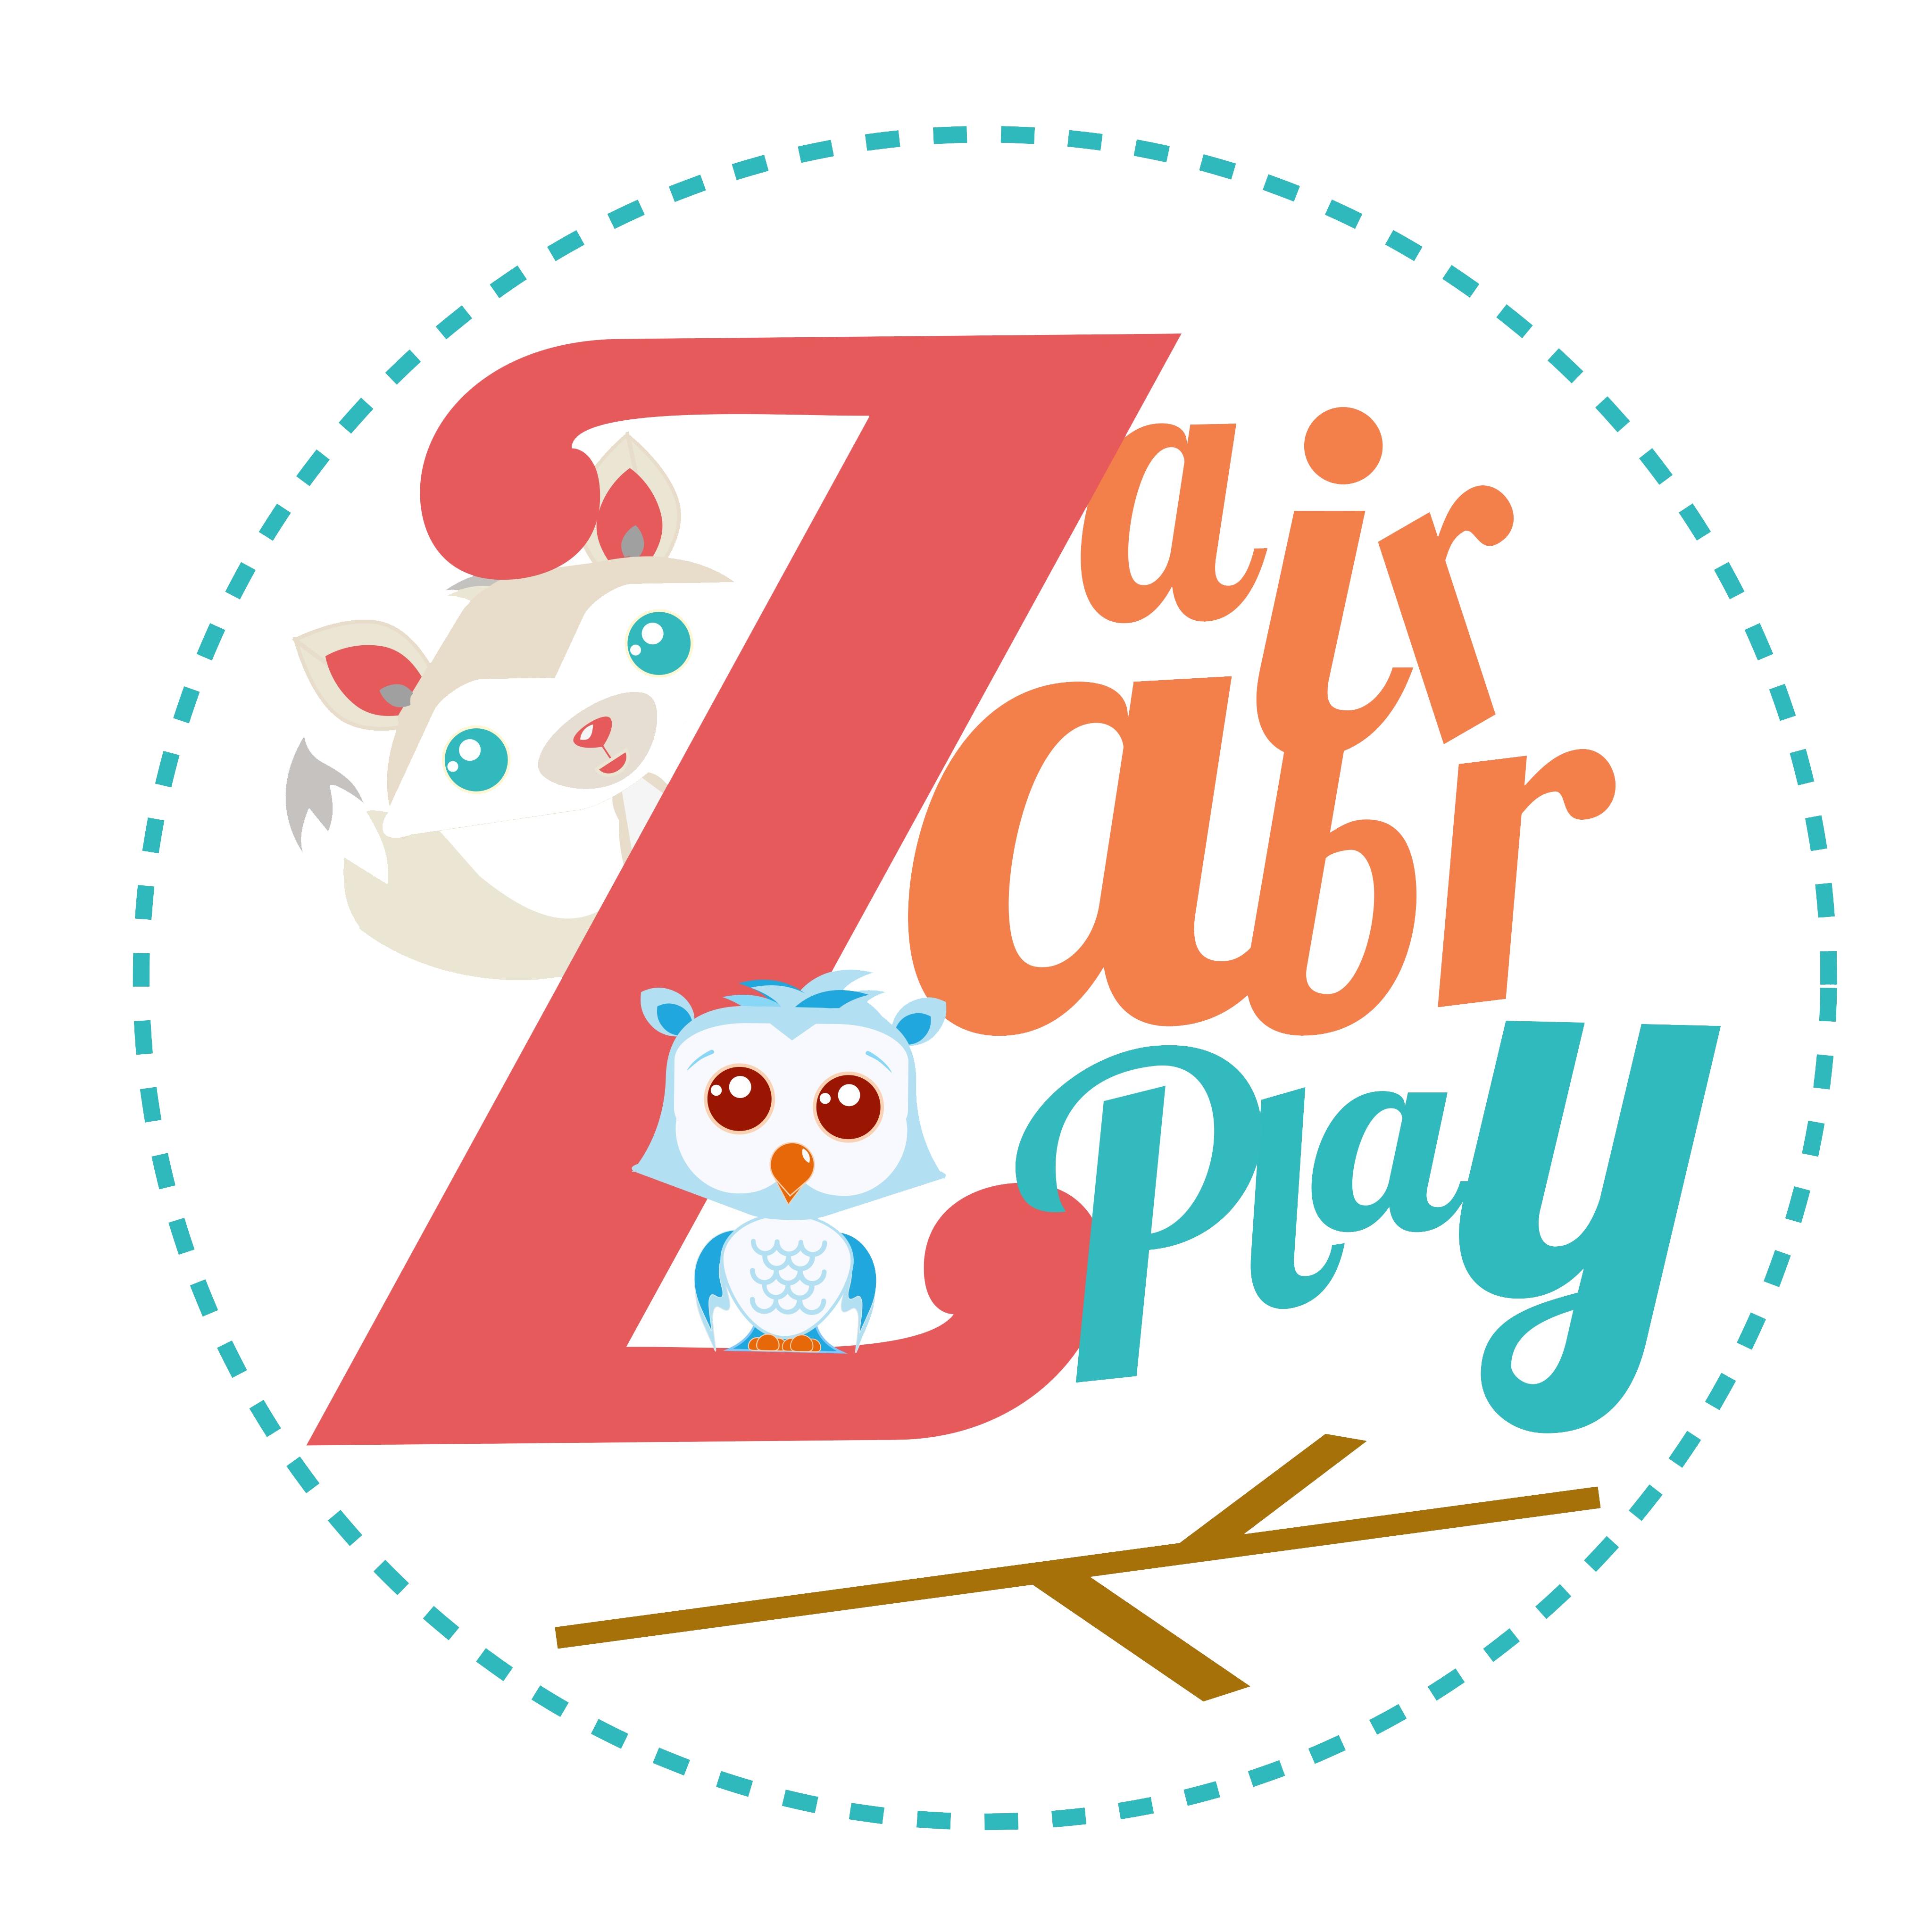 Zair Zabr Play Logo